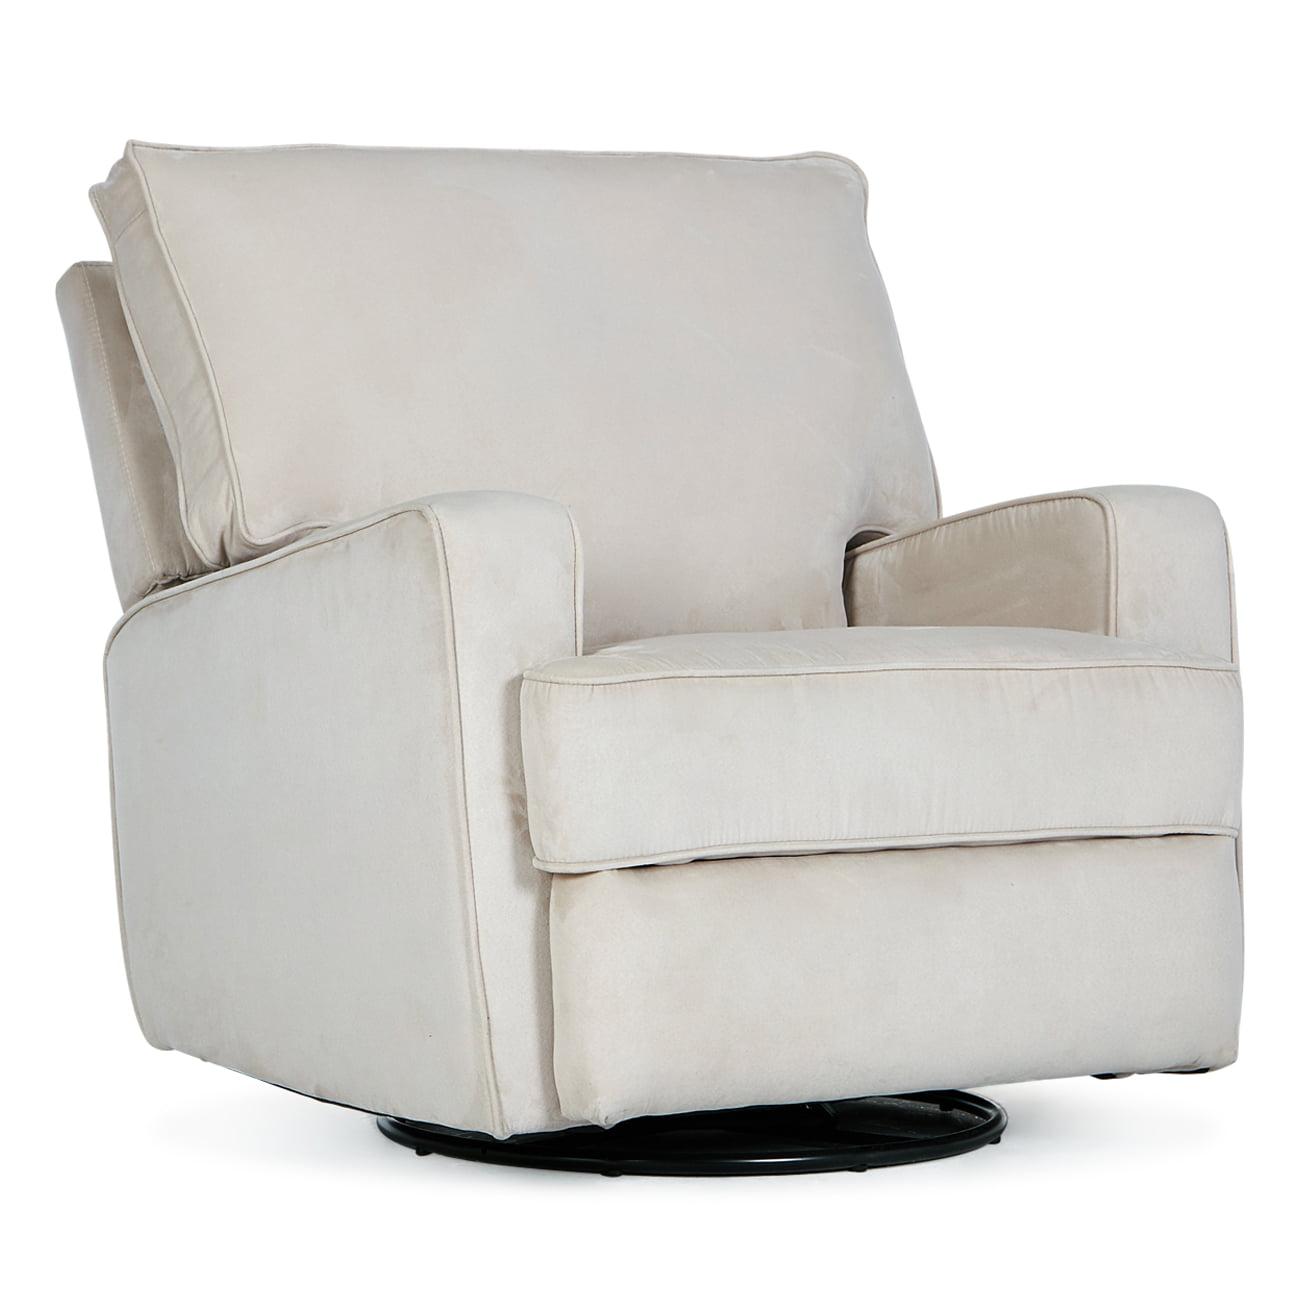 Belleze recliner chair upholstered beige walmart com